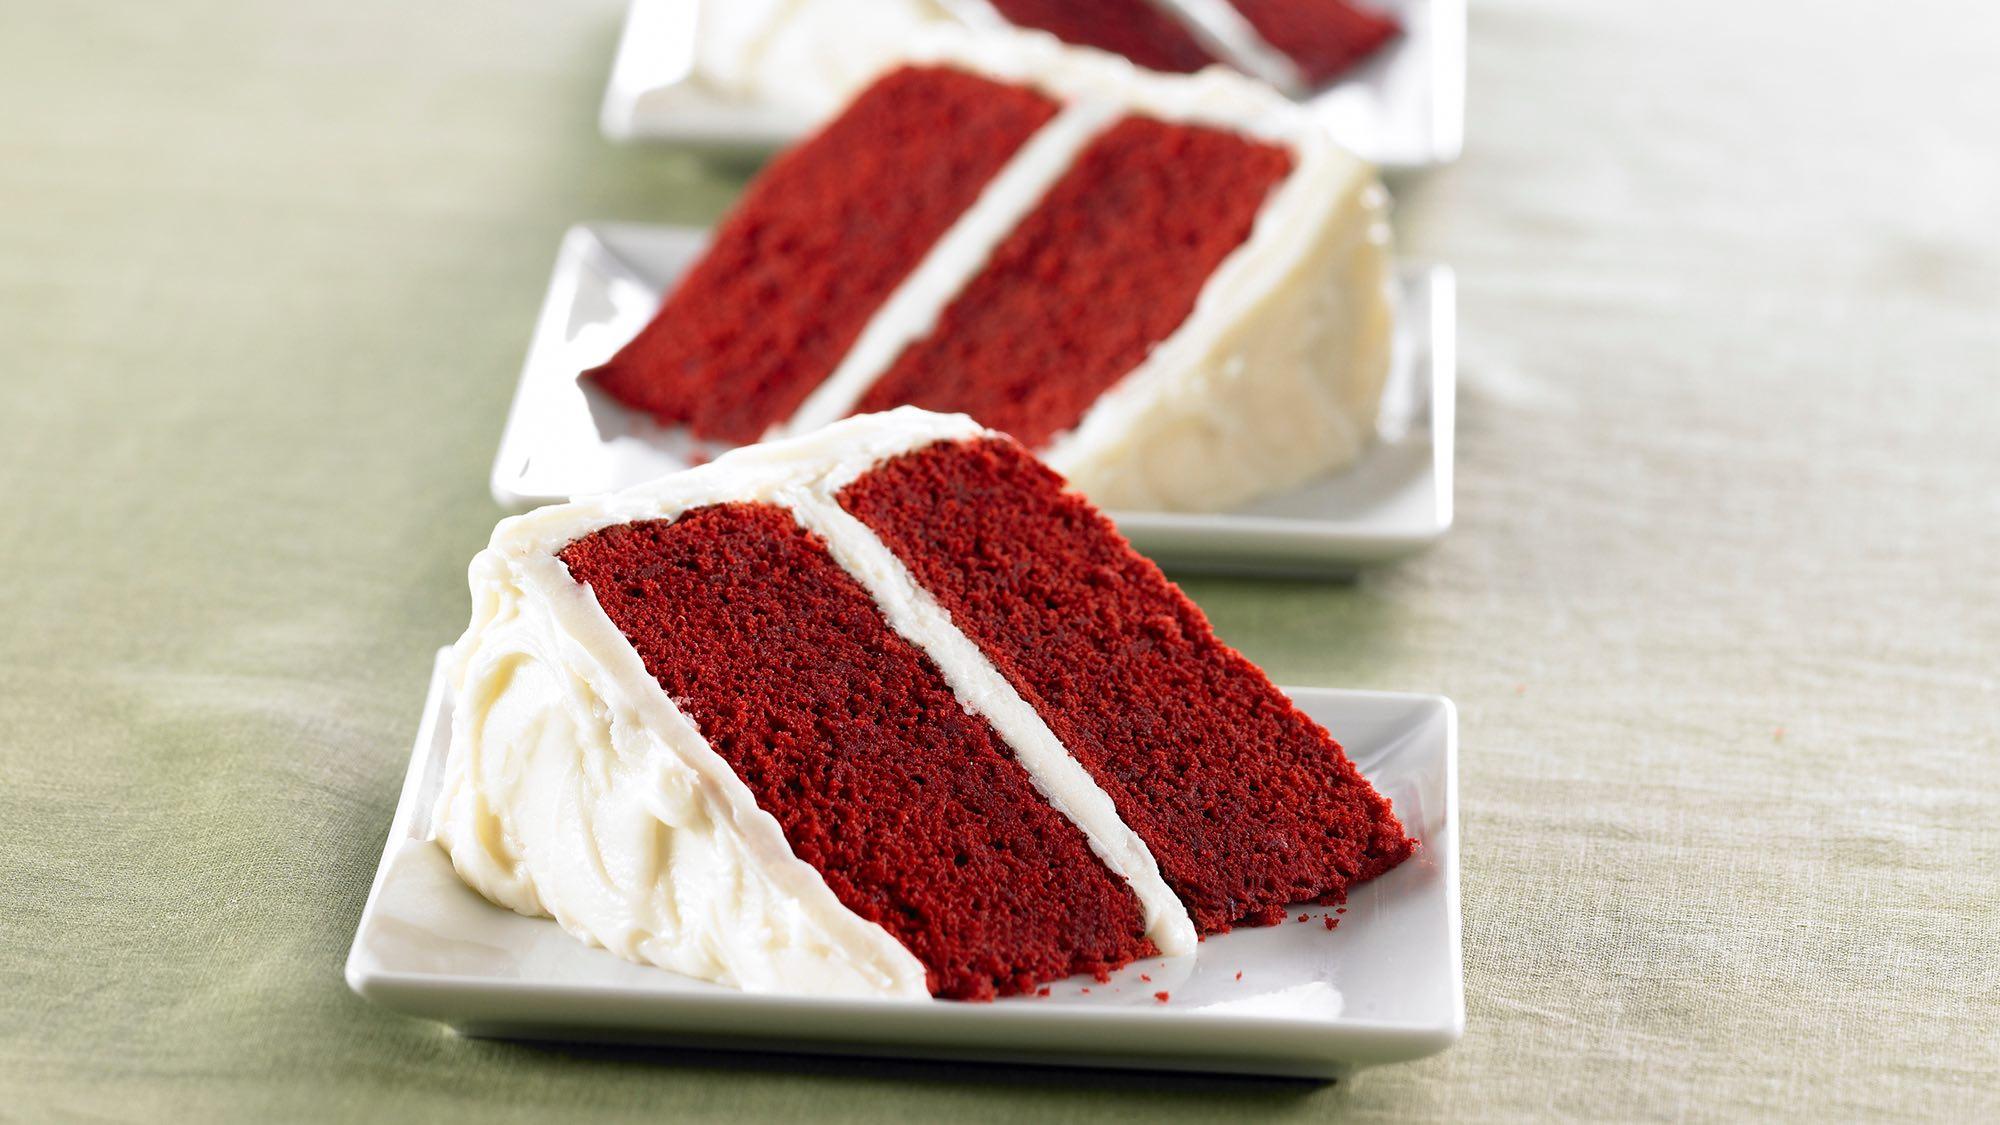 red-velvet-cake-with-vanilla-cream-cheese-frosting.jpg